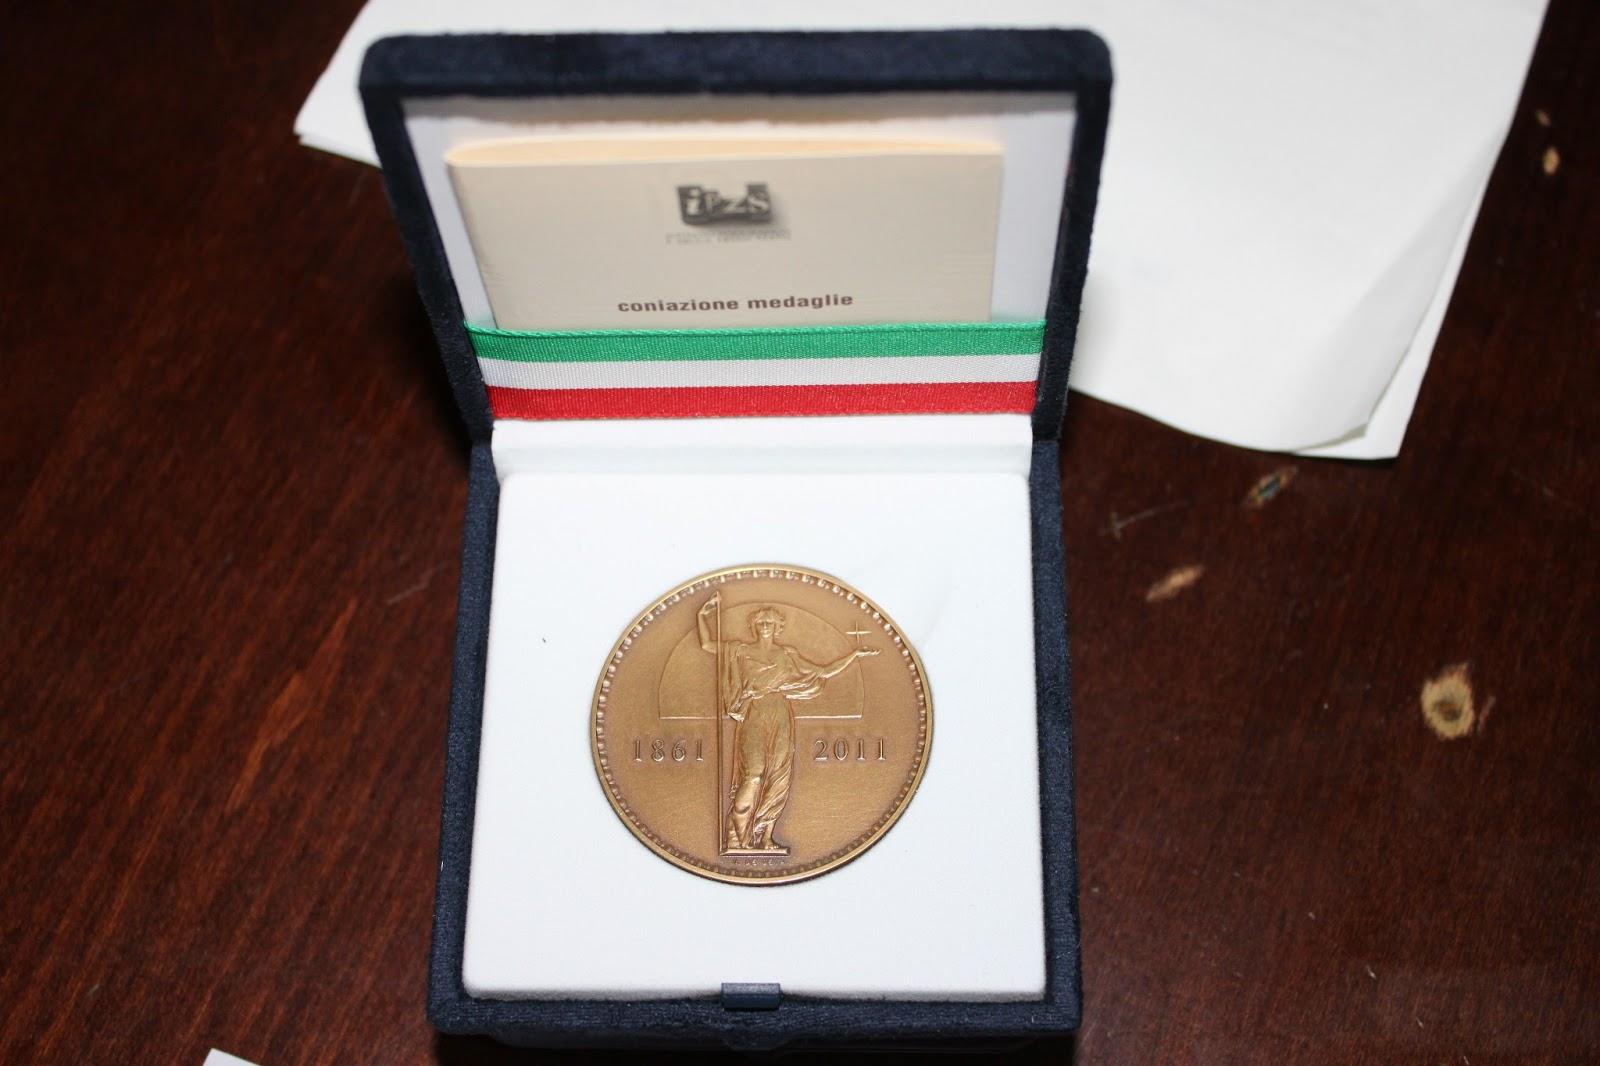 Araba fenice blog medaglie assegnate all 39 araba fenice dal for Presidente camera dei deputati 2013